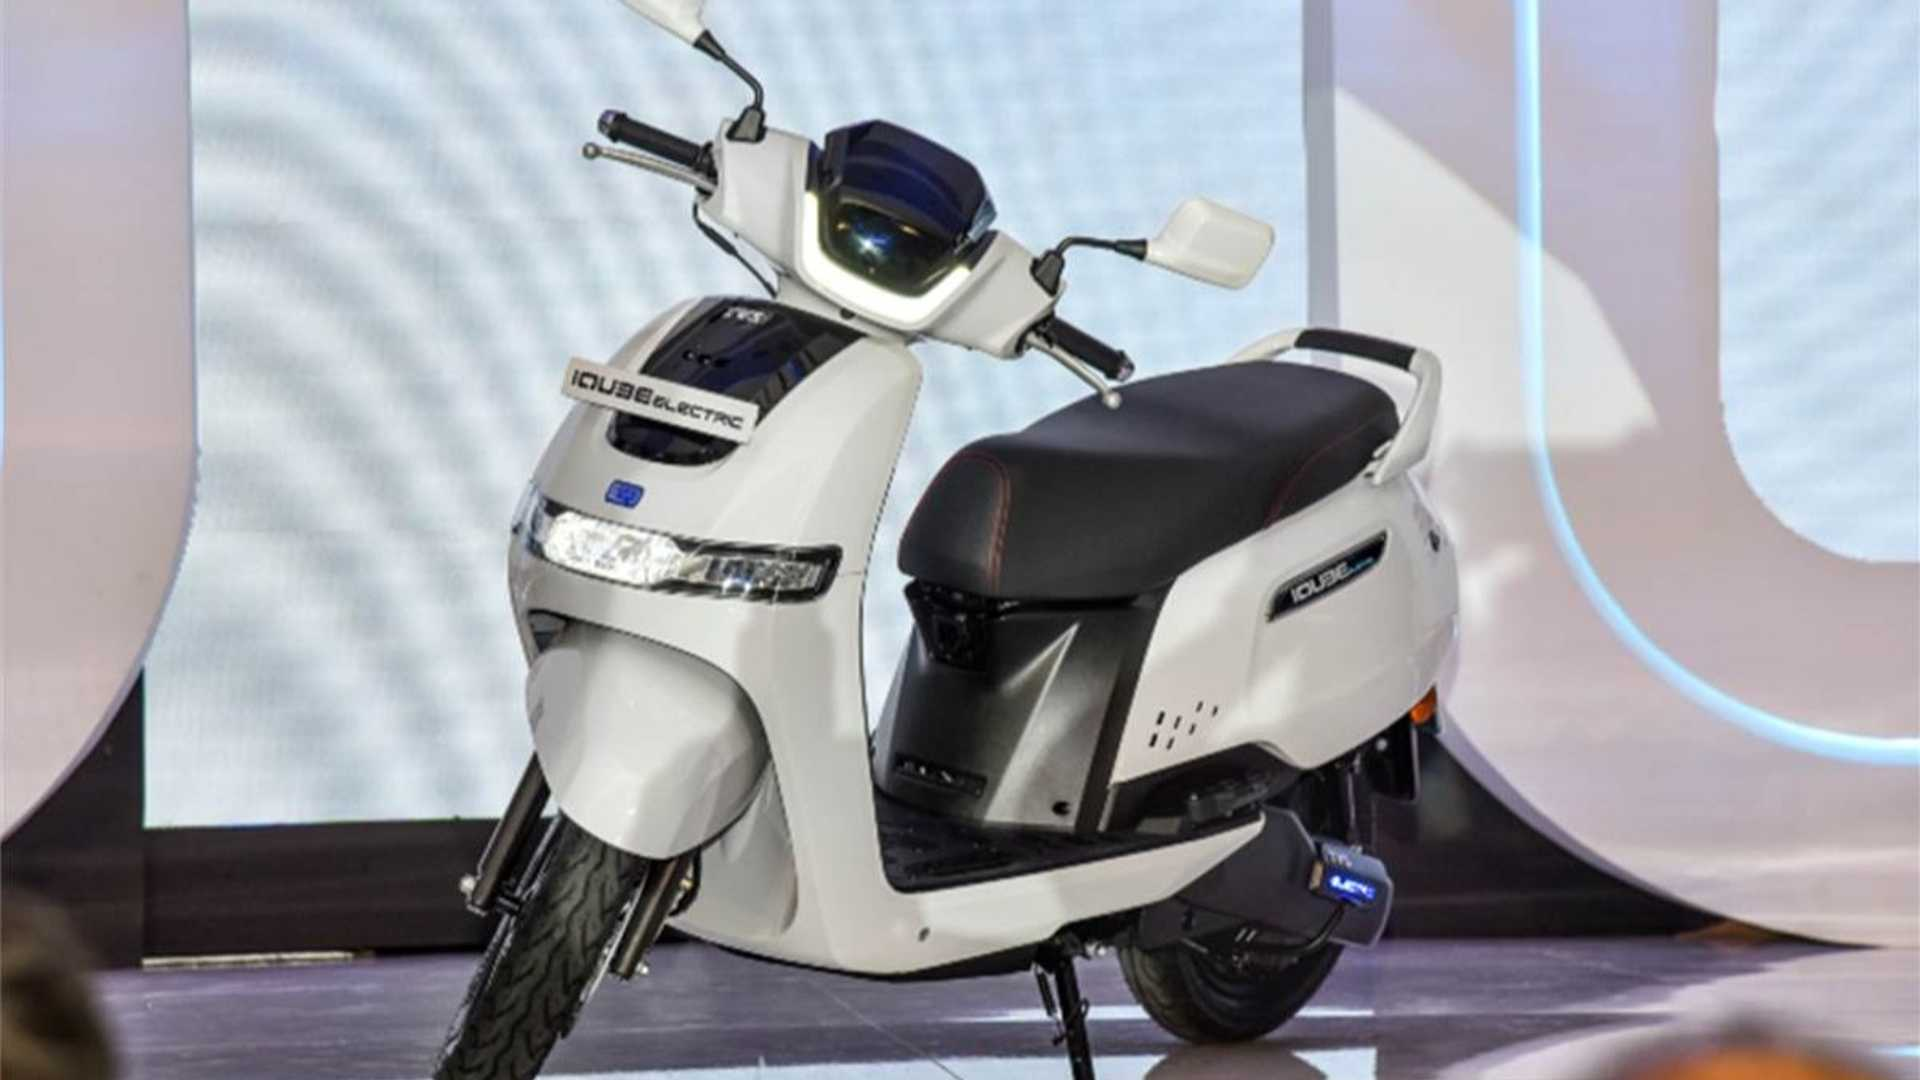 2021 tvs Electric scooter ,tvs Electric,tvs electric scooter,tvs electric bike price,tvs electric scooter price in bangalore,tvs electric scooter price in delhi, electric scooter price in kolkata,tvs electric bike price in india 2020,tvs electric scooter price in india,tvs electric bike price 20 000